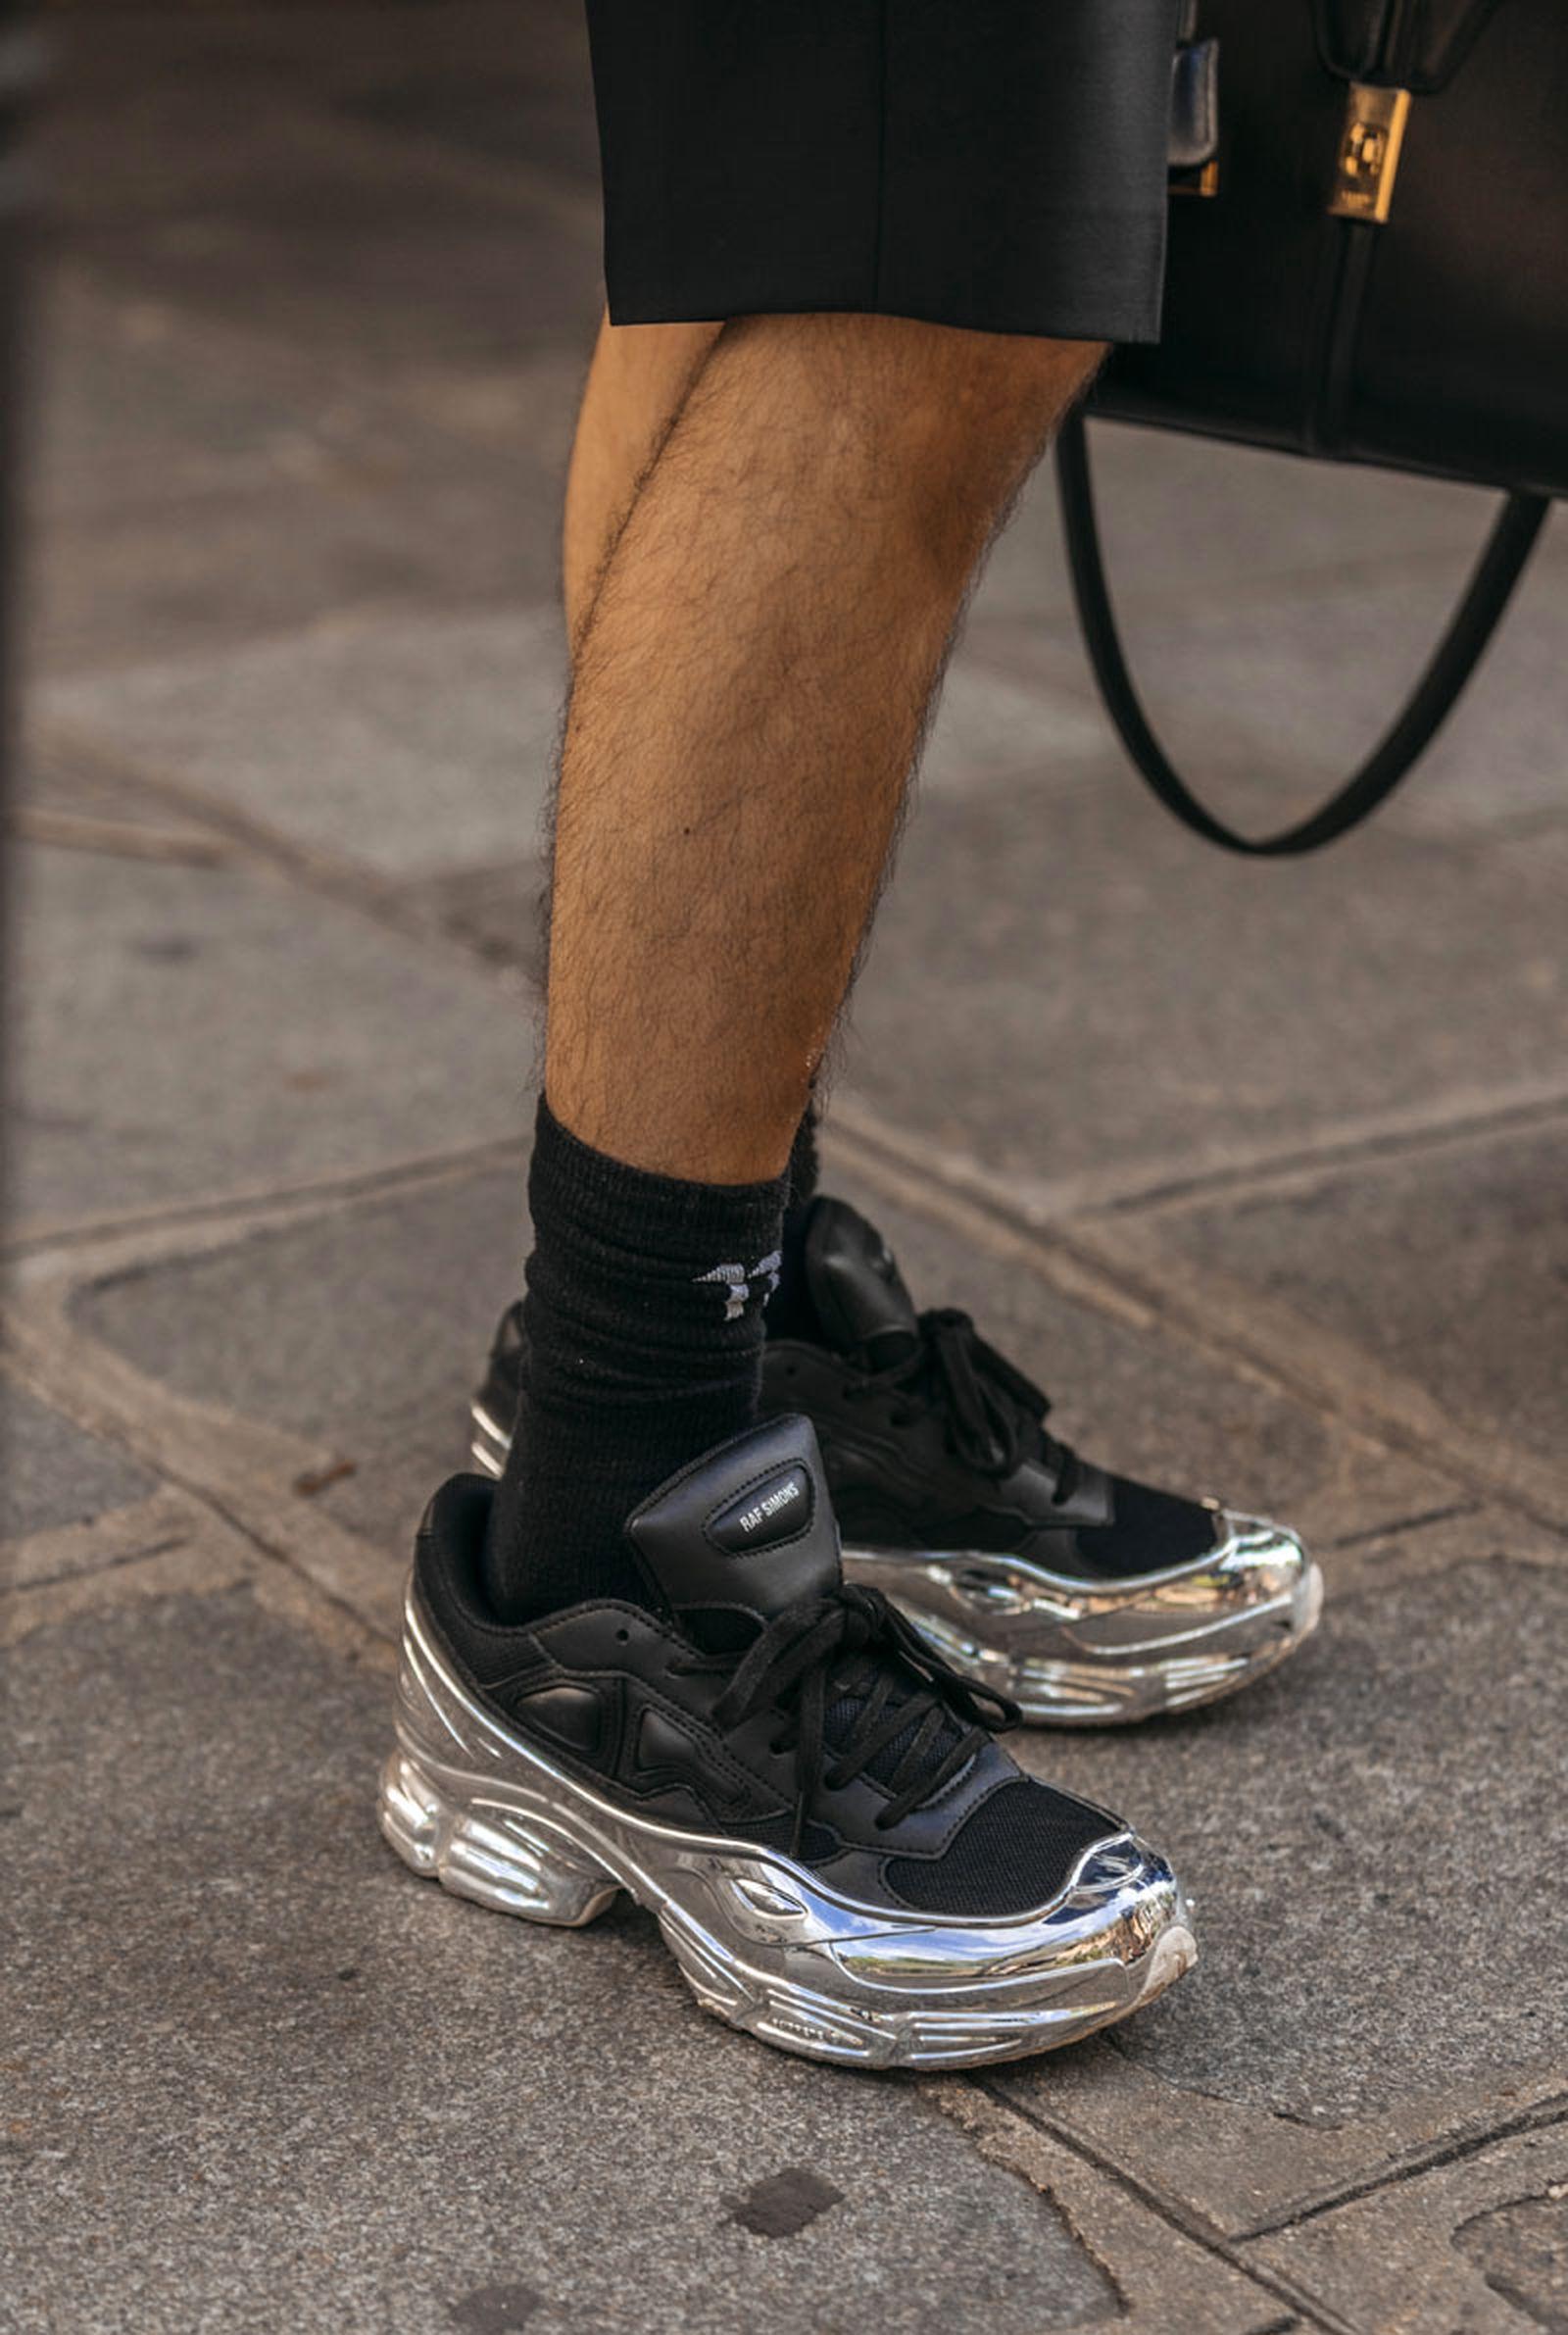 paris fashion week ss20 sneakers 018 Nike comme des garcons li ning